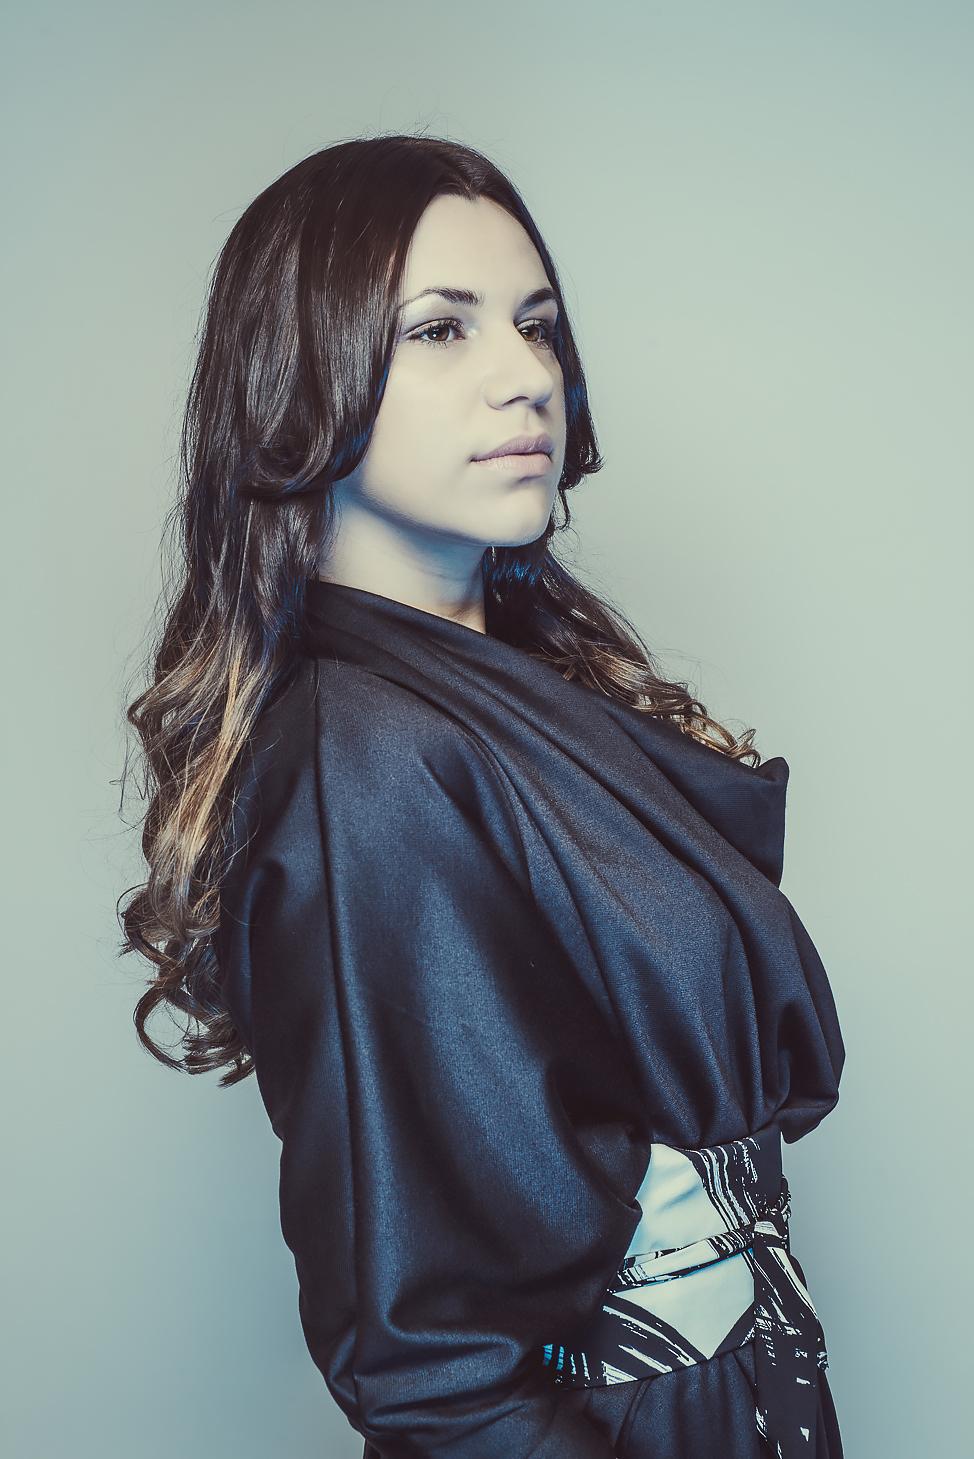 zaramia-ava-zaramiaava-leeds-fashion-designer-ethical-sustainable-tailored-minimalist-aya-print-dress-obi-belt-black-versatile-drape-cowl-styling-womenswear-models-photoshoot-shrine-hairdressers-13